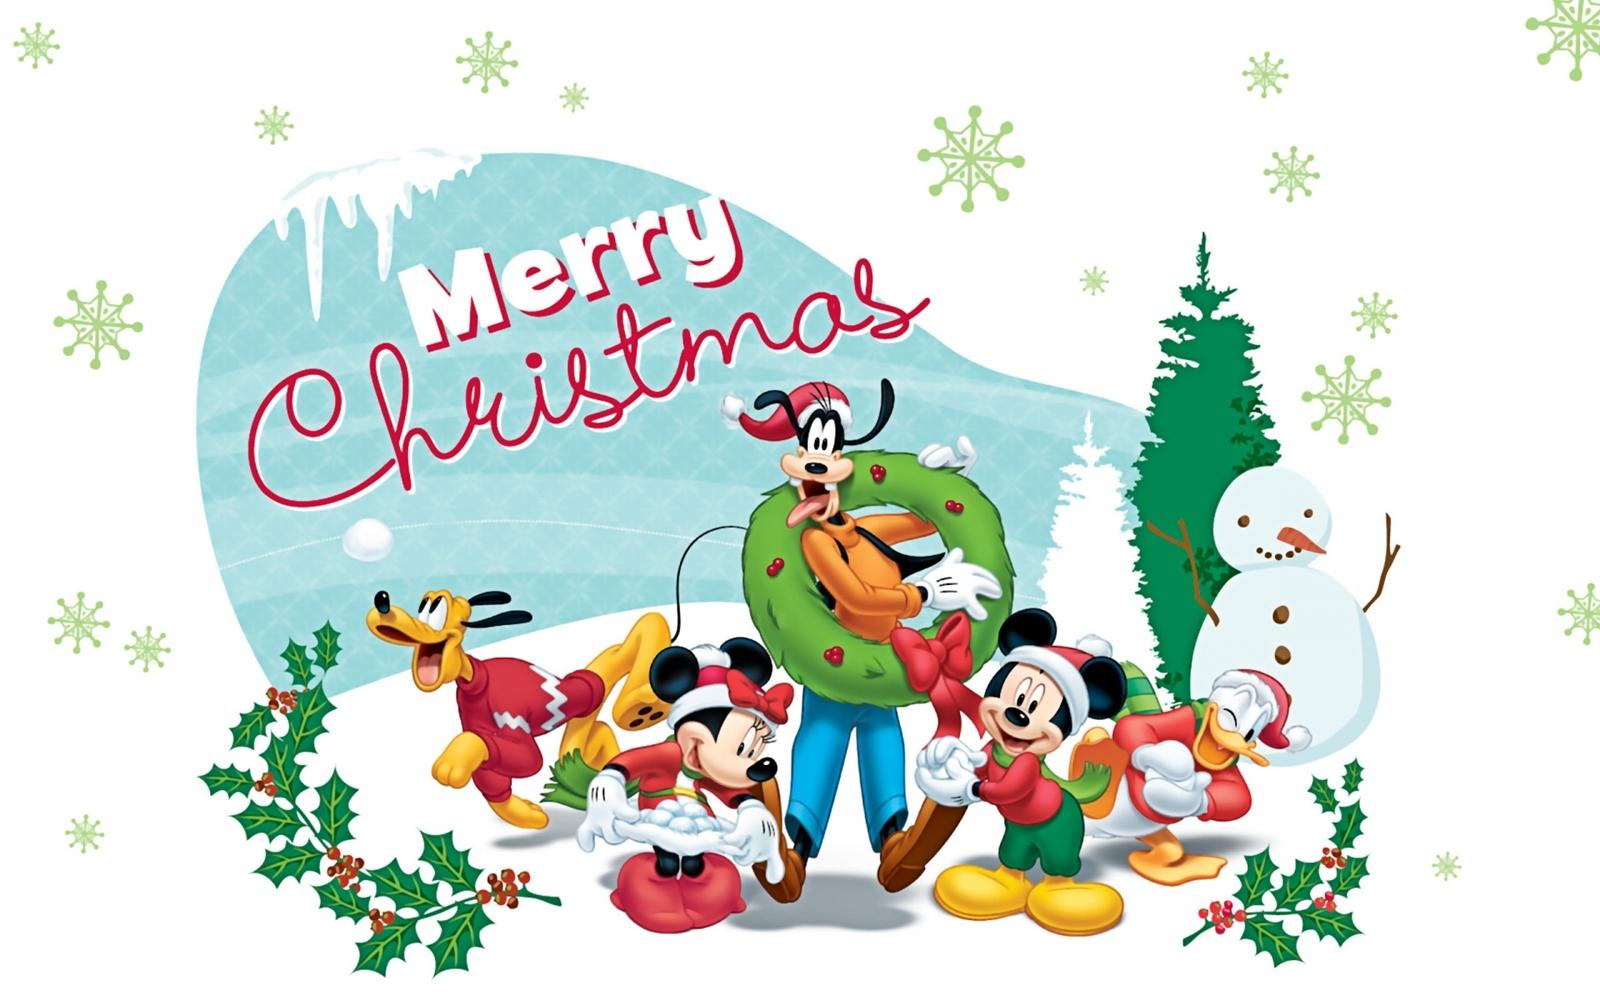 comclubsdisneyimages32956746titledisney christmas wallpaper 1600x1000